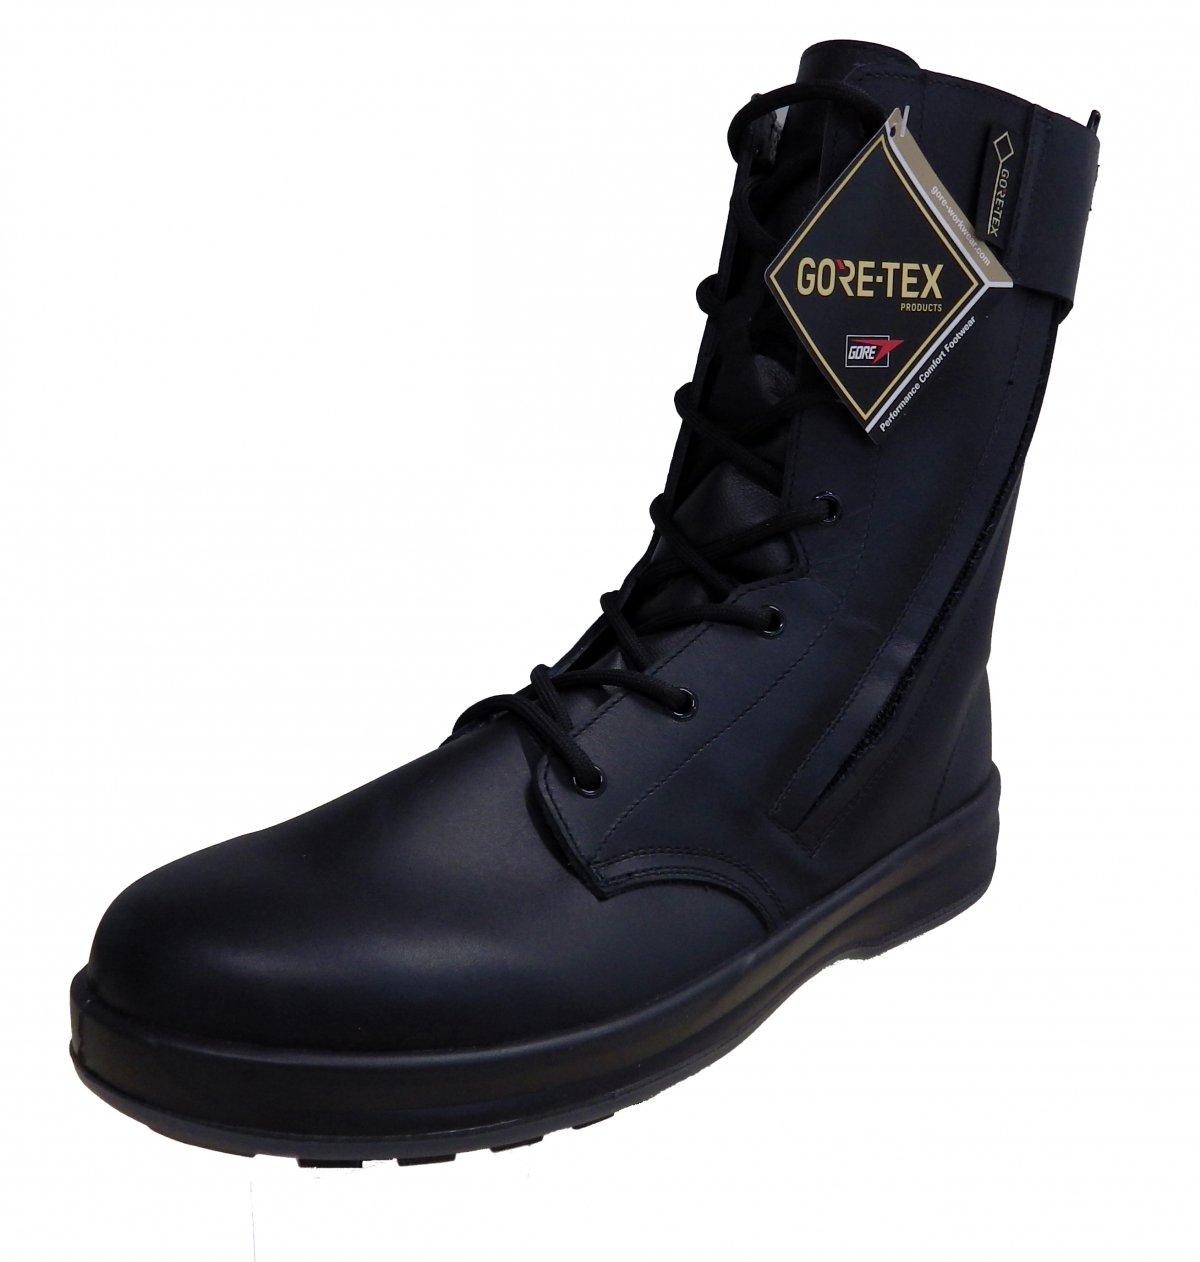 GORE-TEX 編上活動靴 WS33HiFR【画像2】